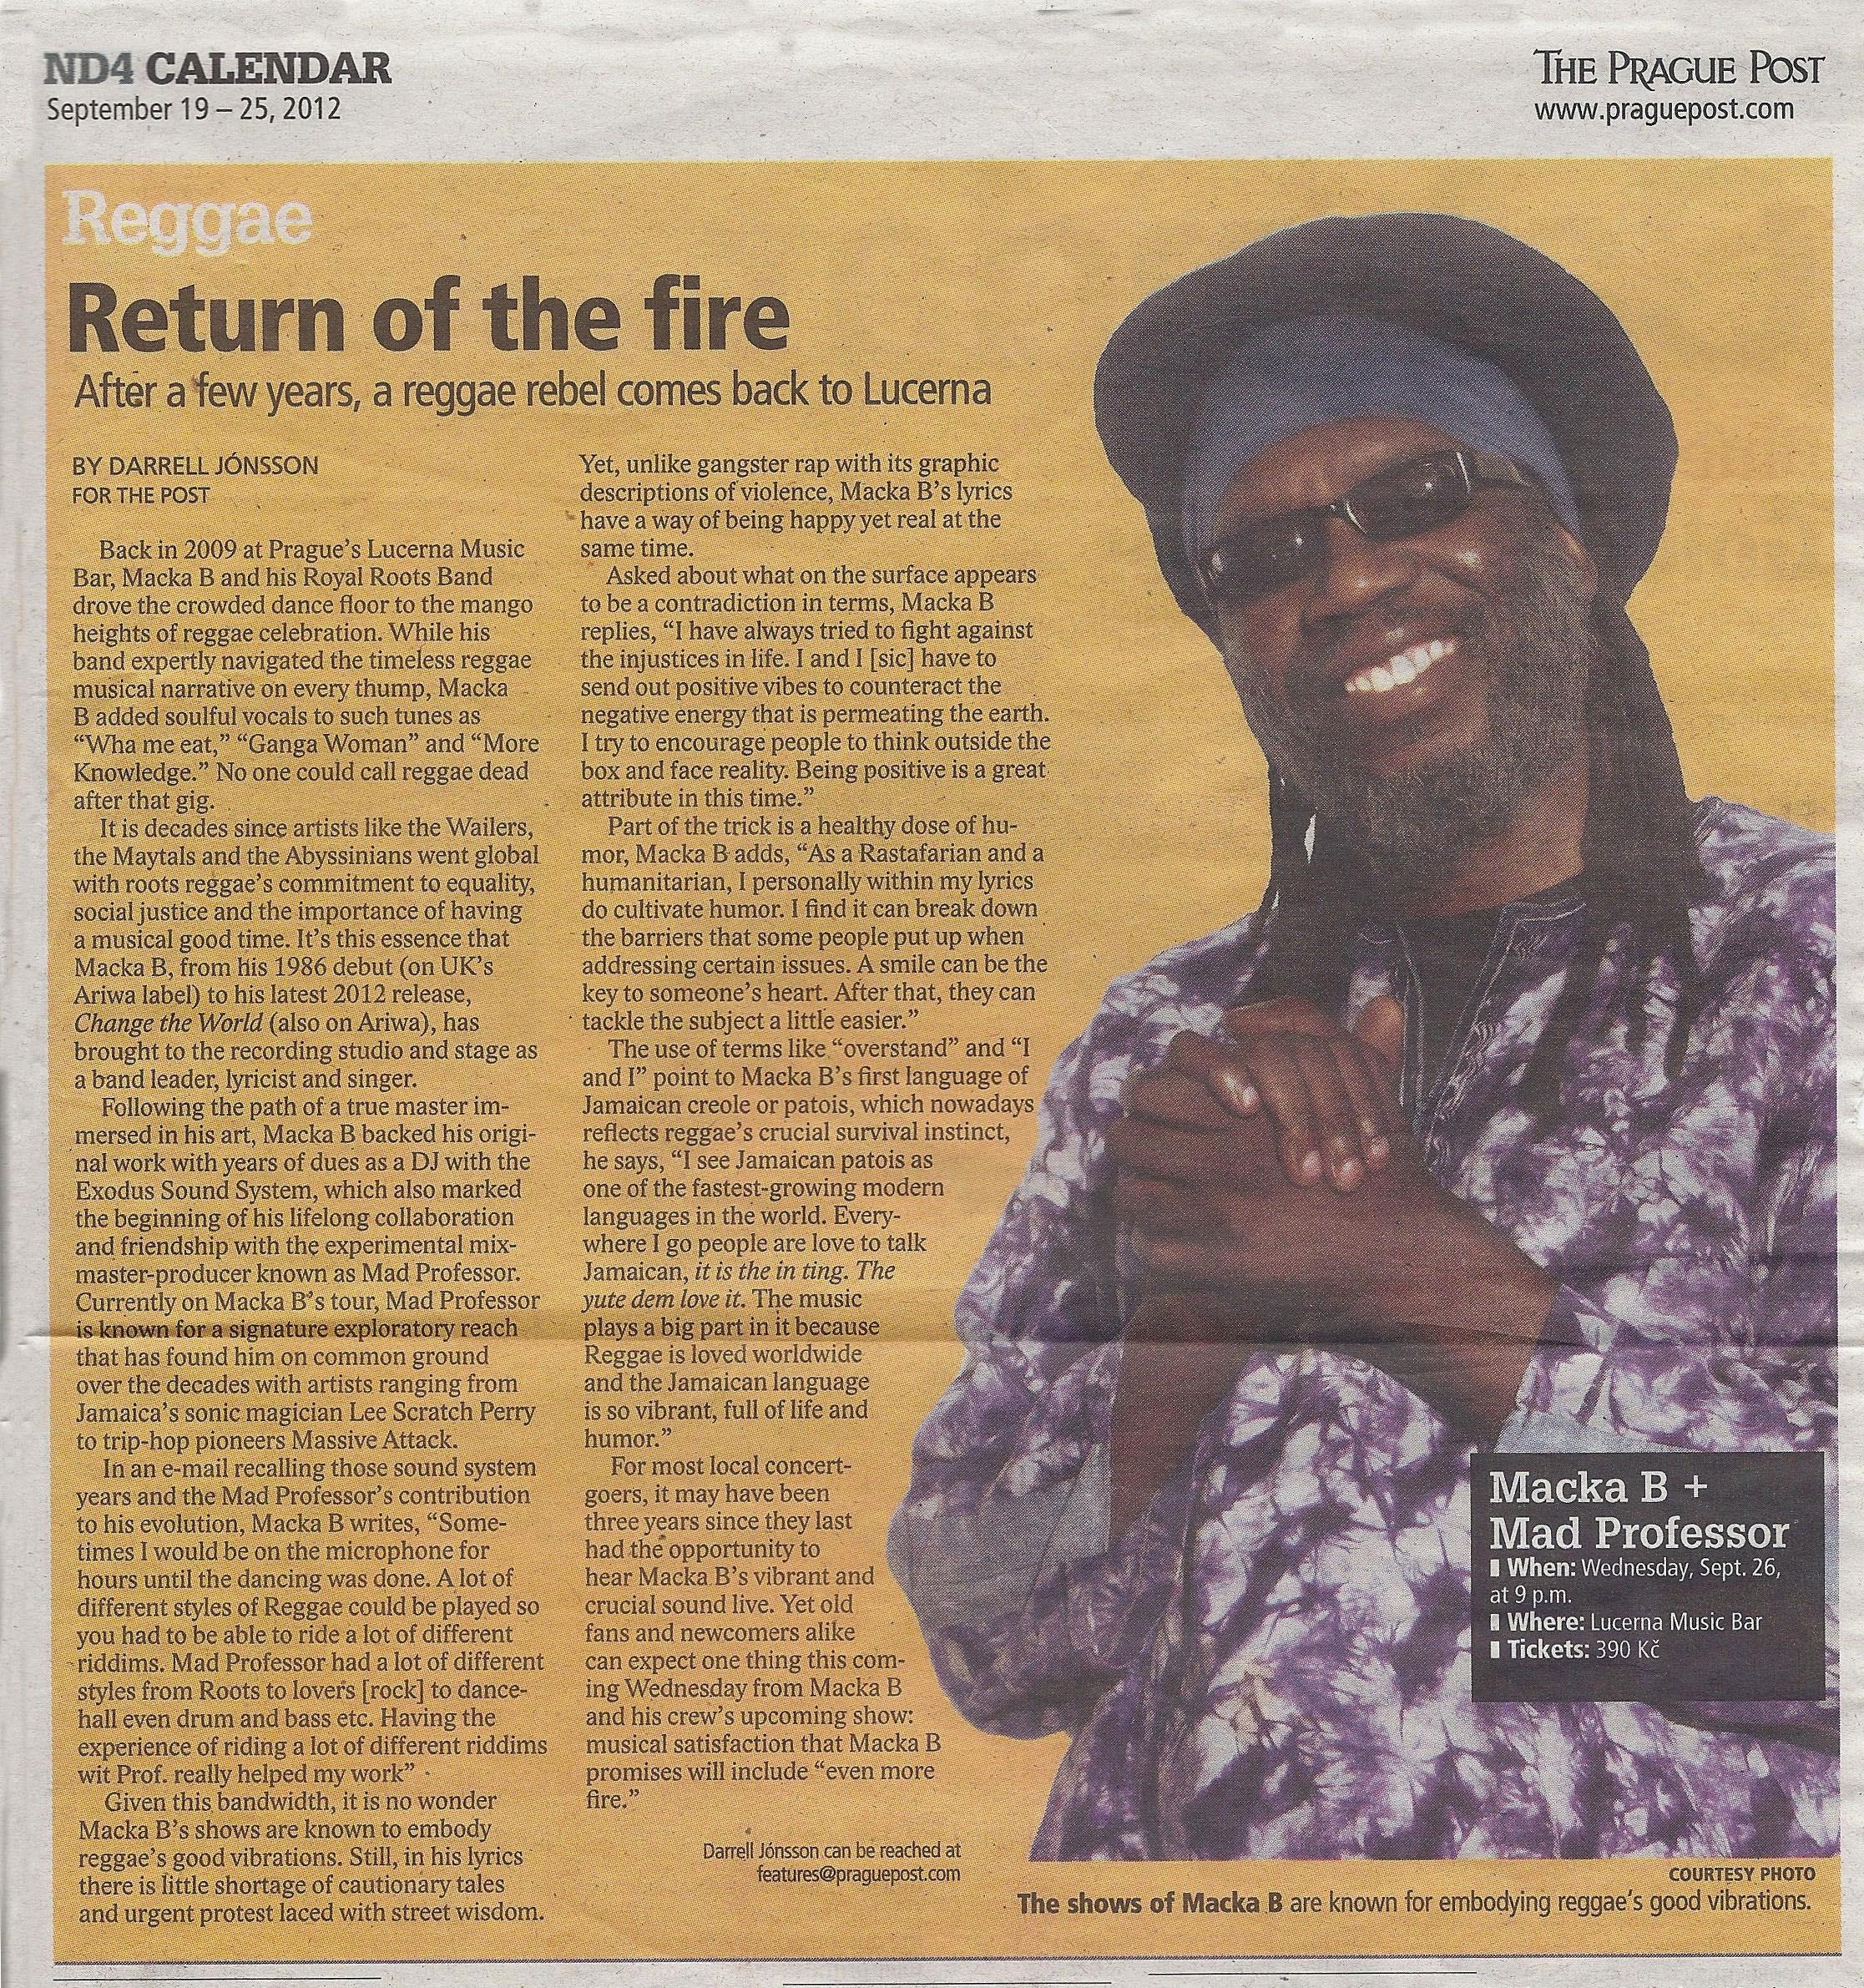 reggae_return_of_the_fire_edited